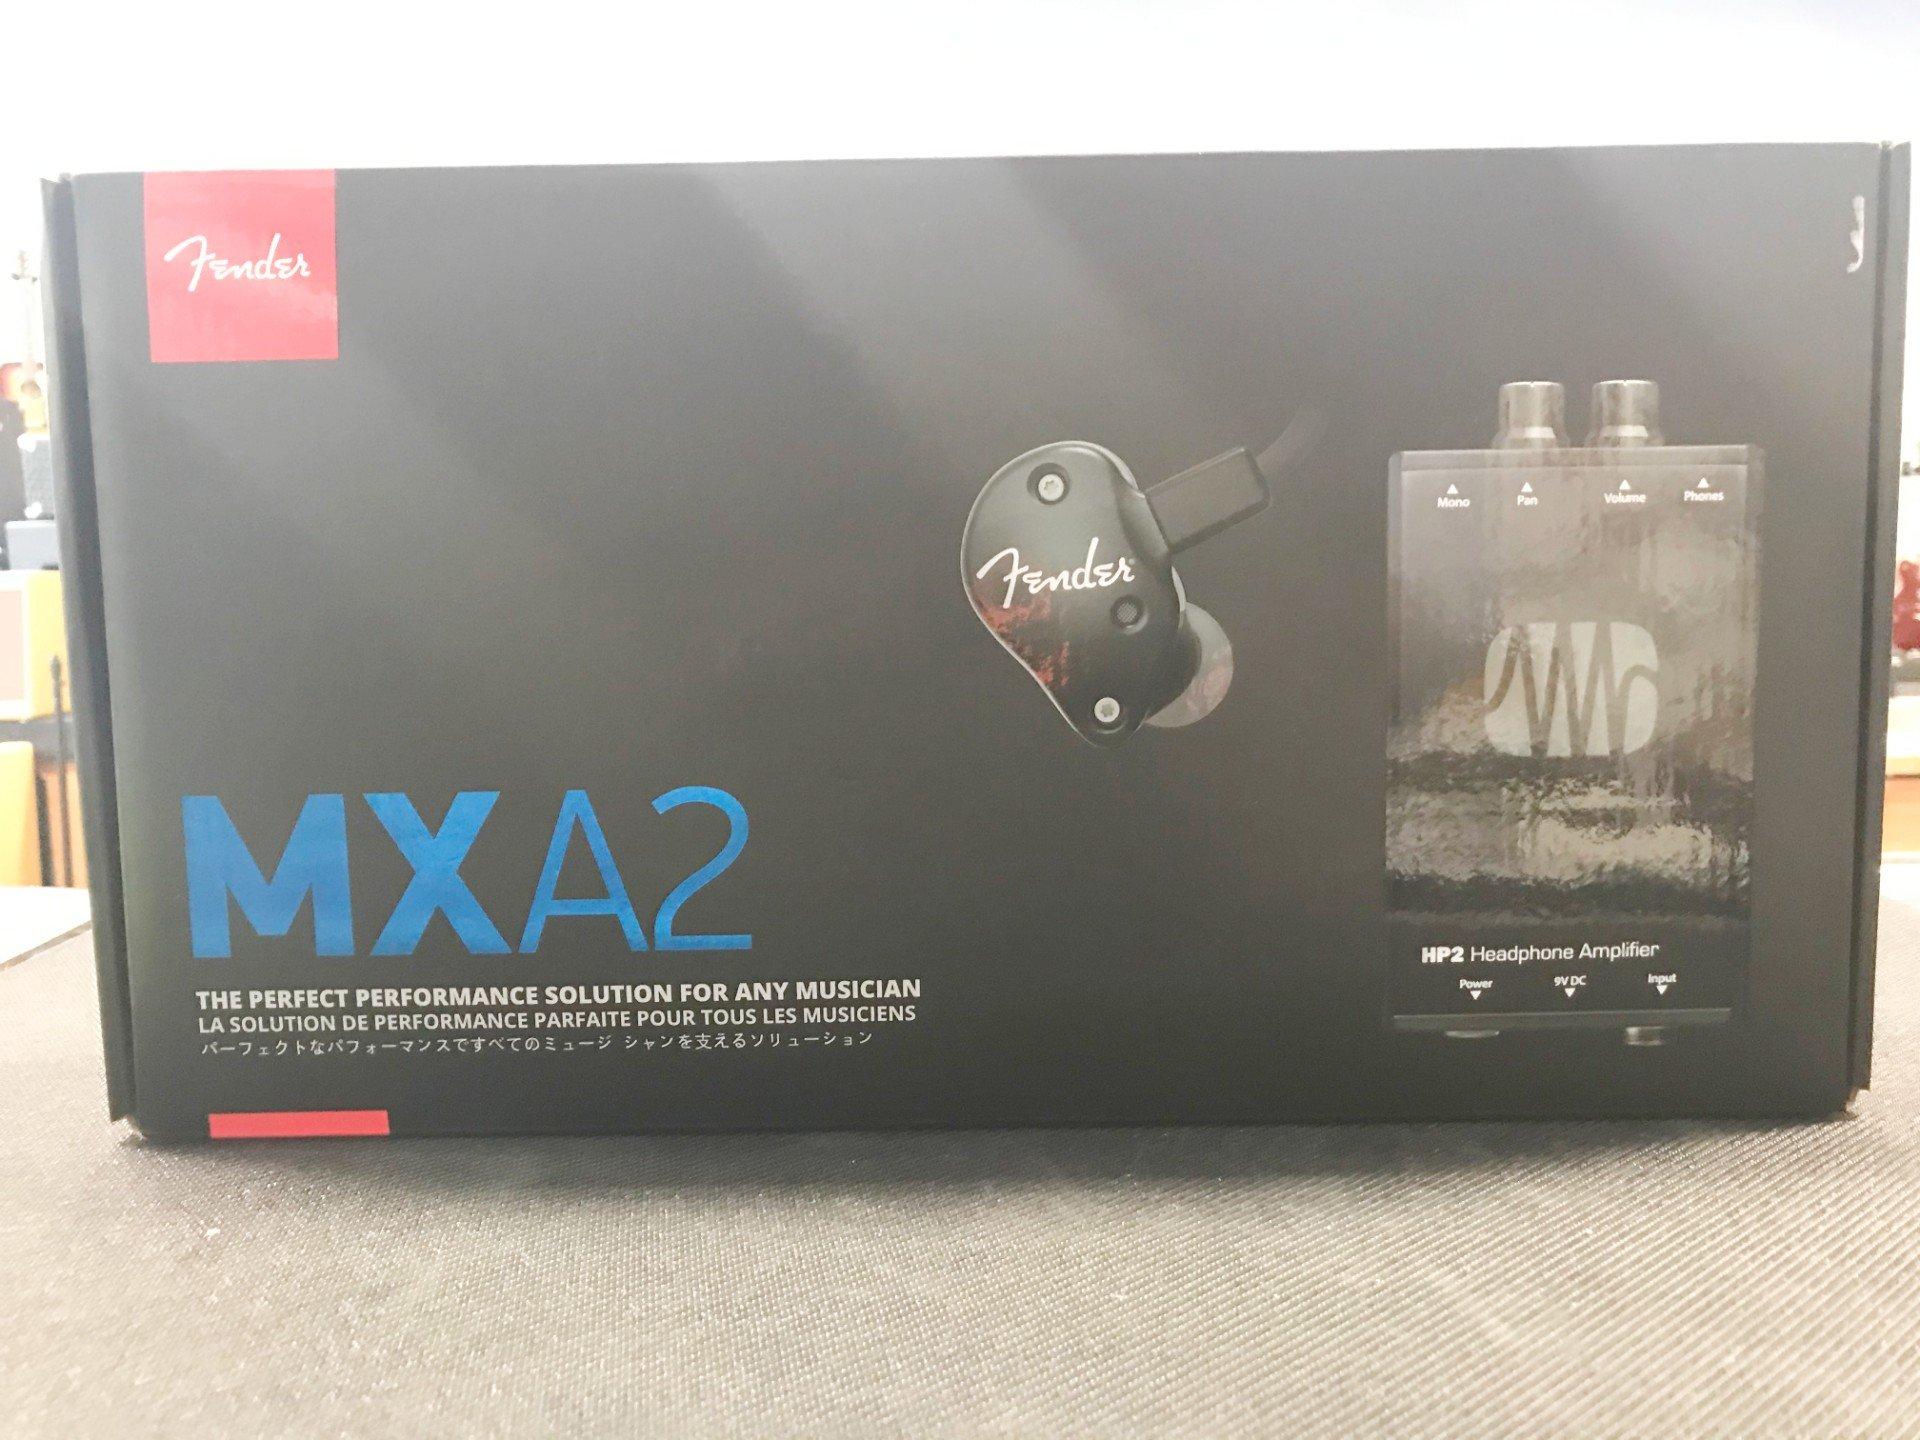 MXA2 Bundle - FXA2 (Black) Pro IEM W/ Presonus HP2 Headphone Amplifier